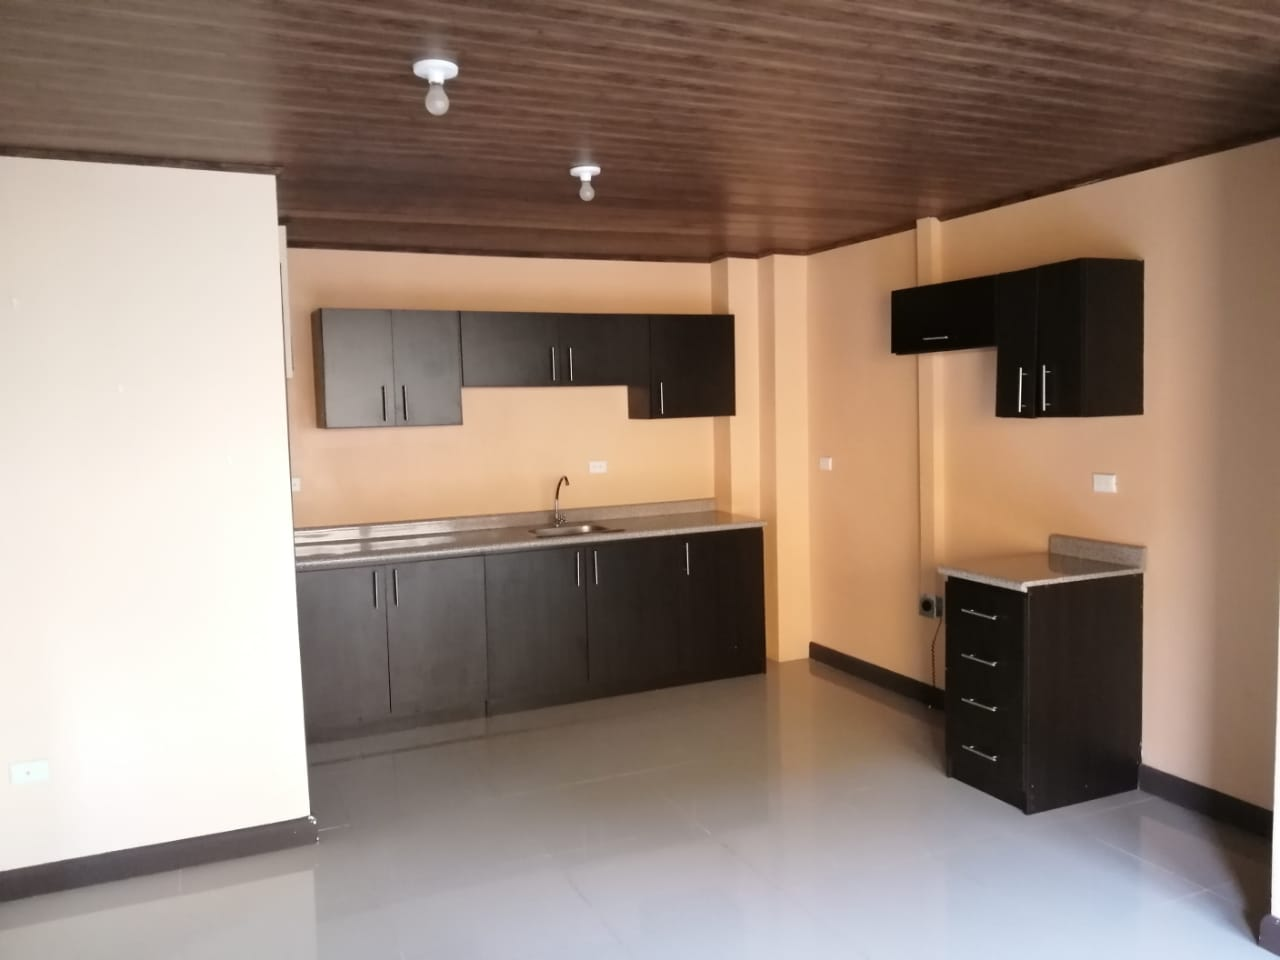 519 For sale 4 apartments building in La Uruca